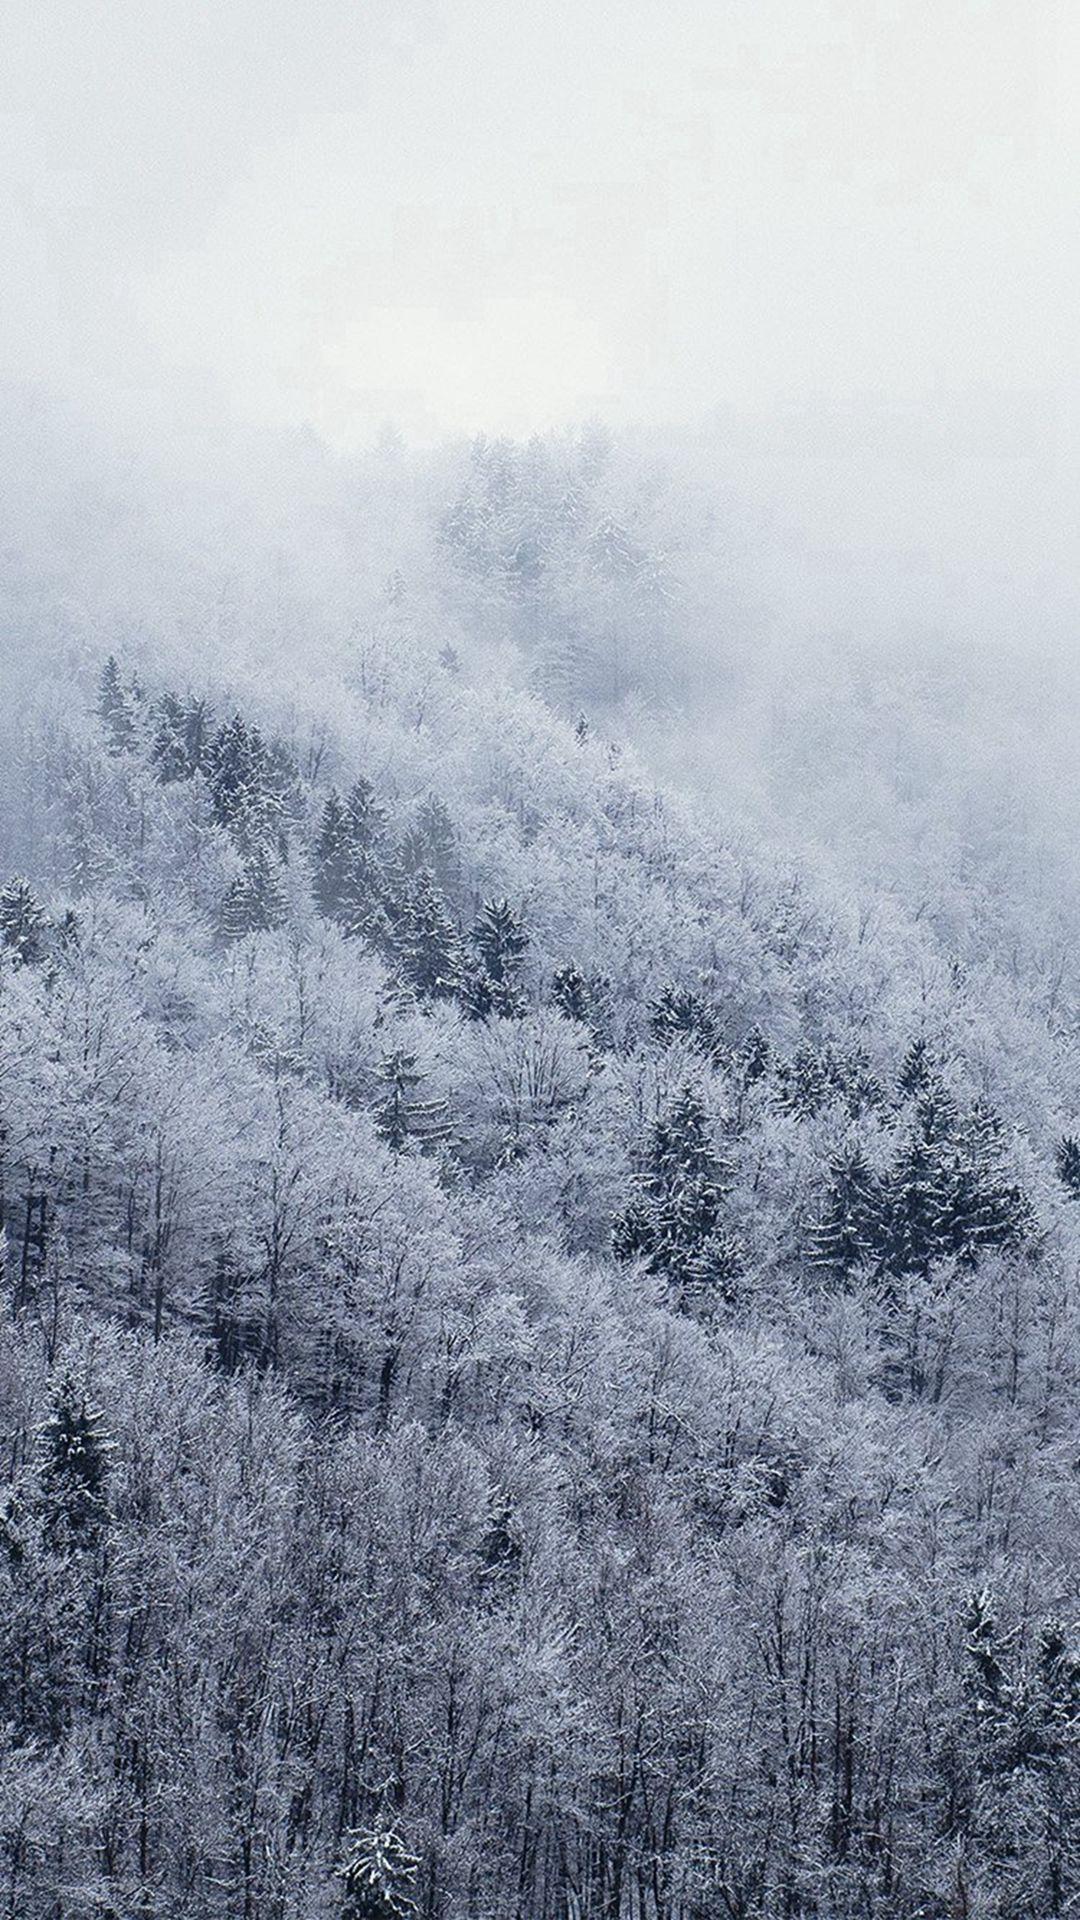 Must see Wallpaper Mountain Christmas - e50452a64c2e2c0126fdc4d06ae88f47  HD_29049.jpg